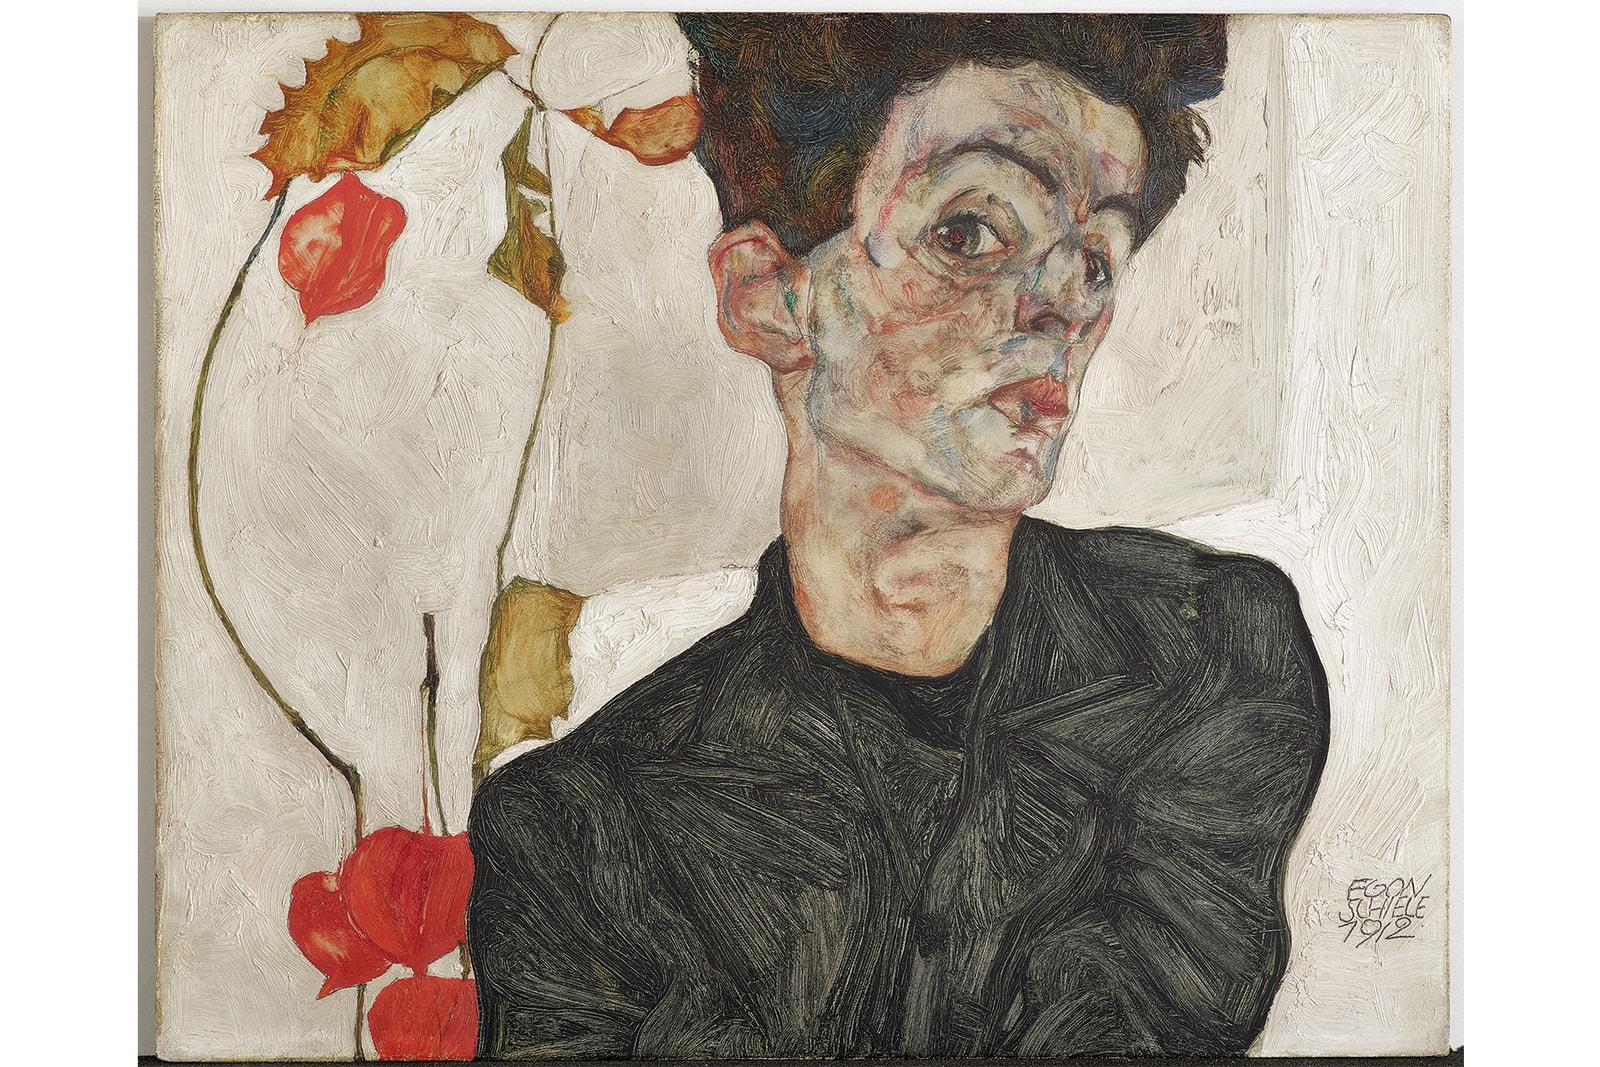 Fondation Louis Vuitton 將開辦「Egon Schiele - Jean-Michel Basquiat」展覽